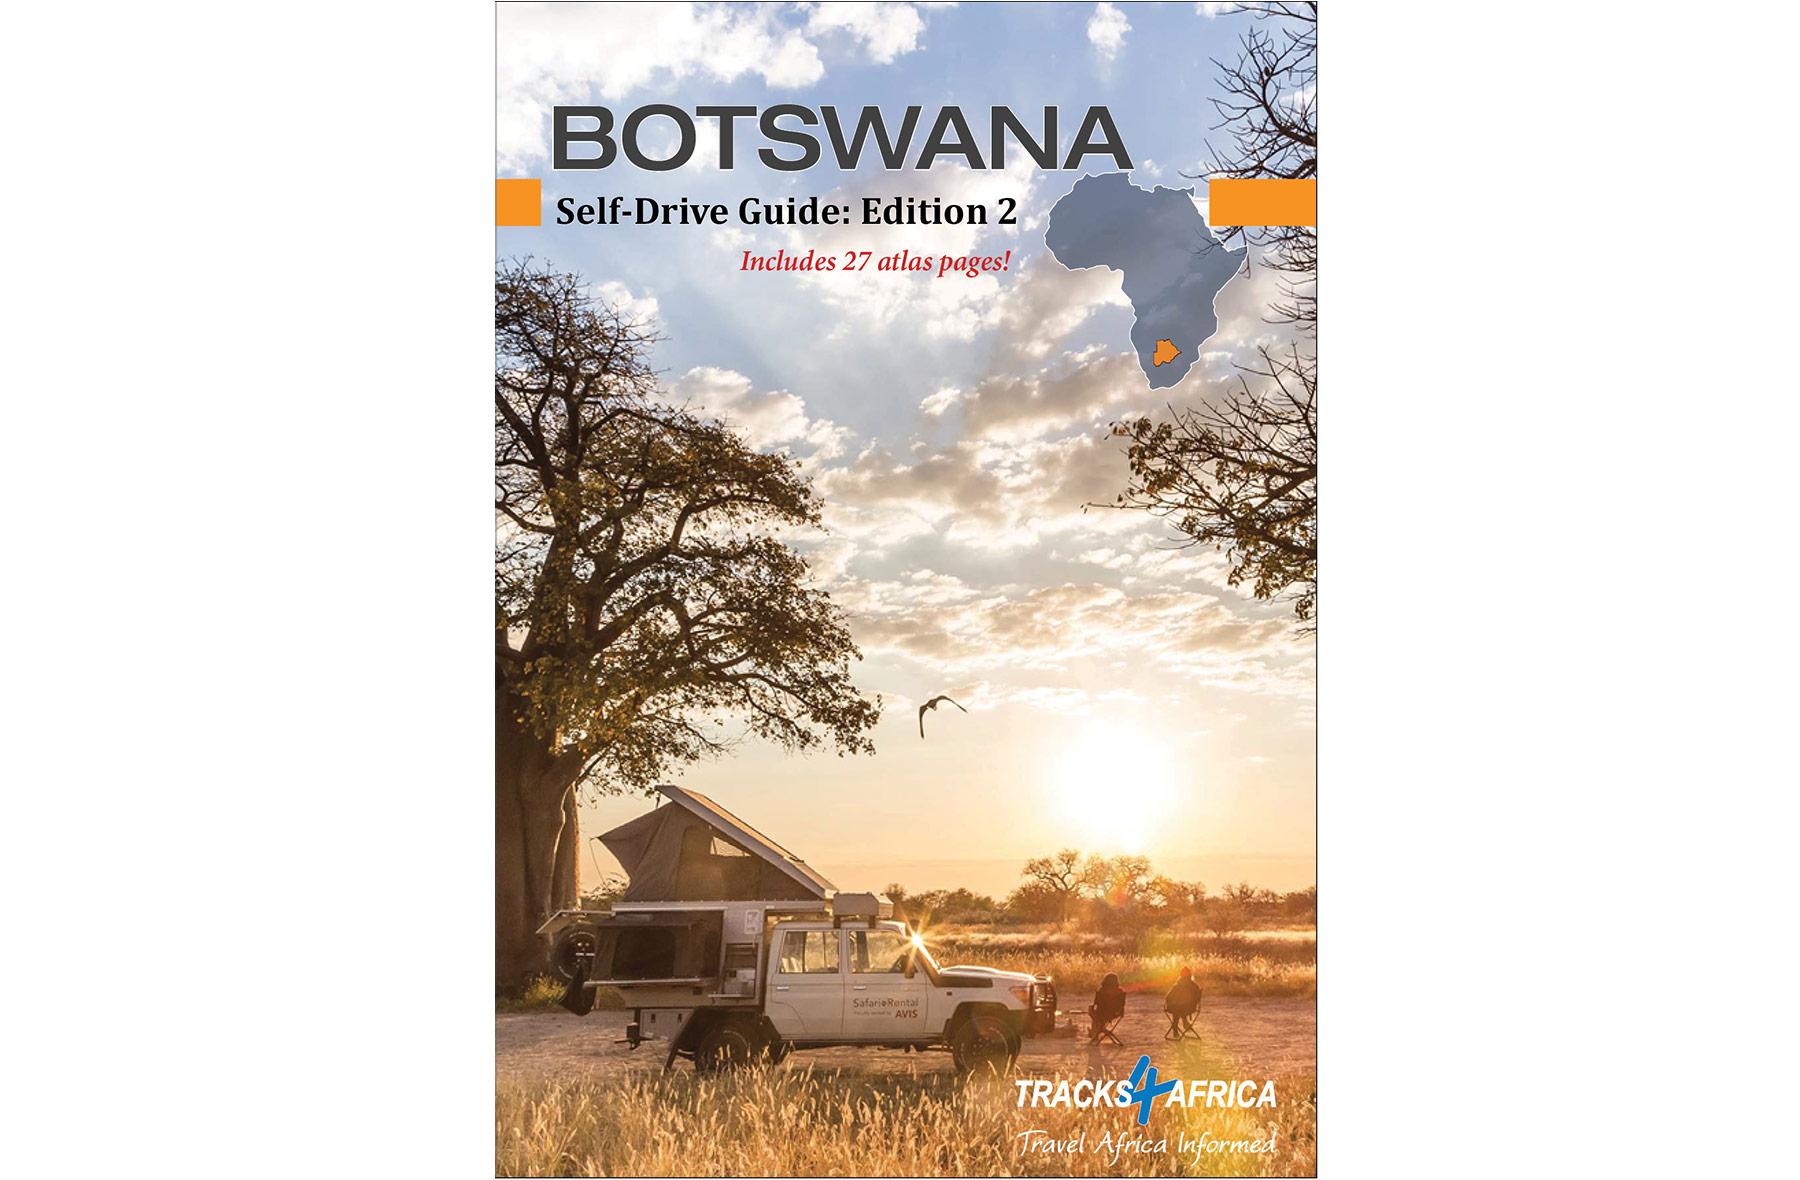 Tracks4Africa - Botswana Self-Drive Guide Book Cover Image